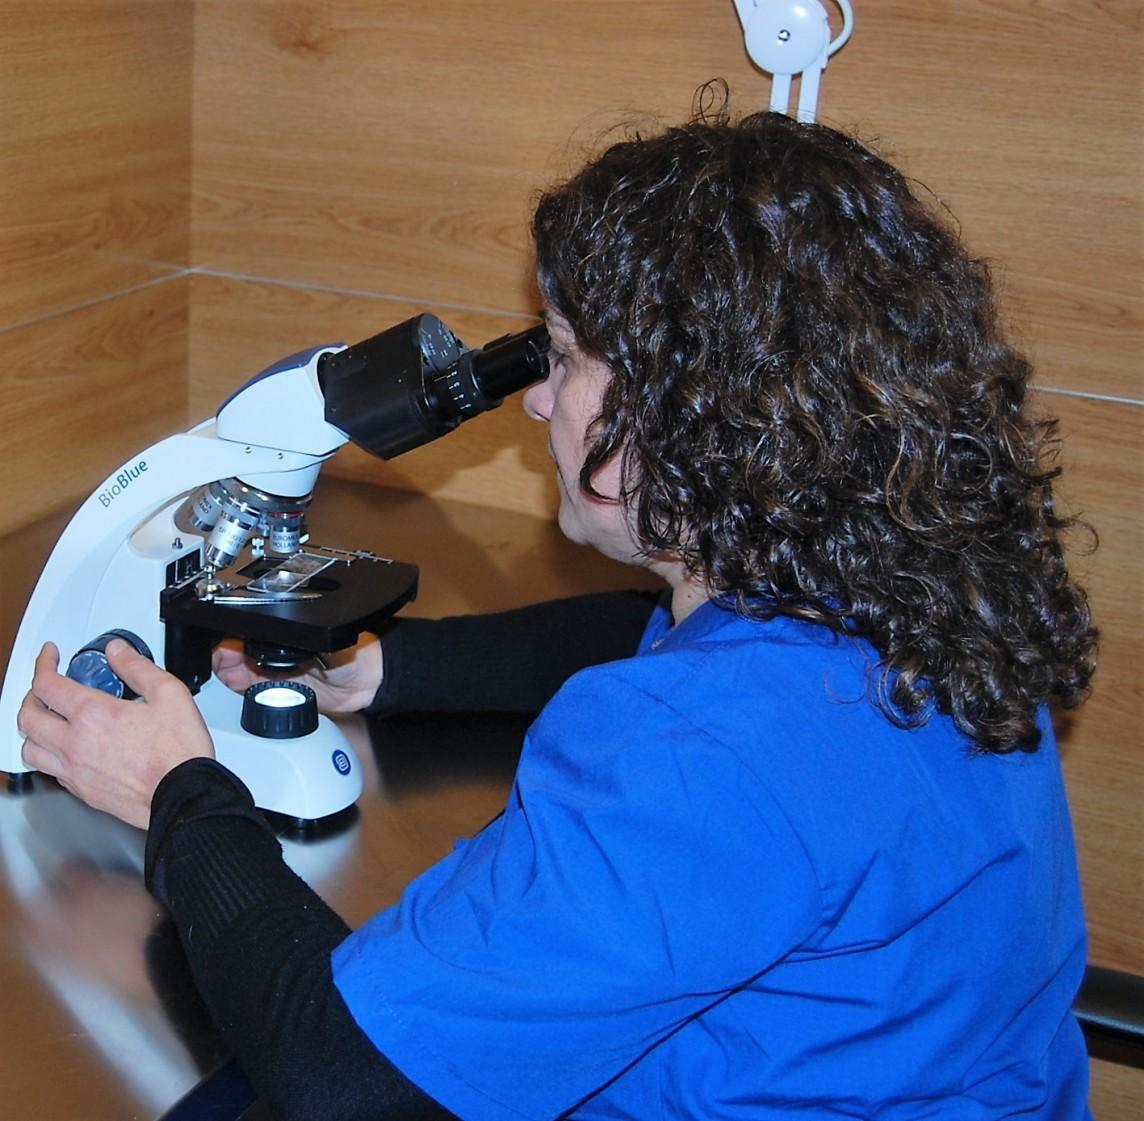 Analísis clínicos en la clínica veterinaria la Vinyala en Sant Vicenç dels Horts